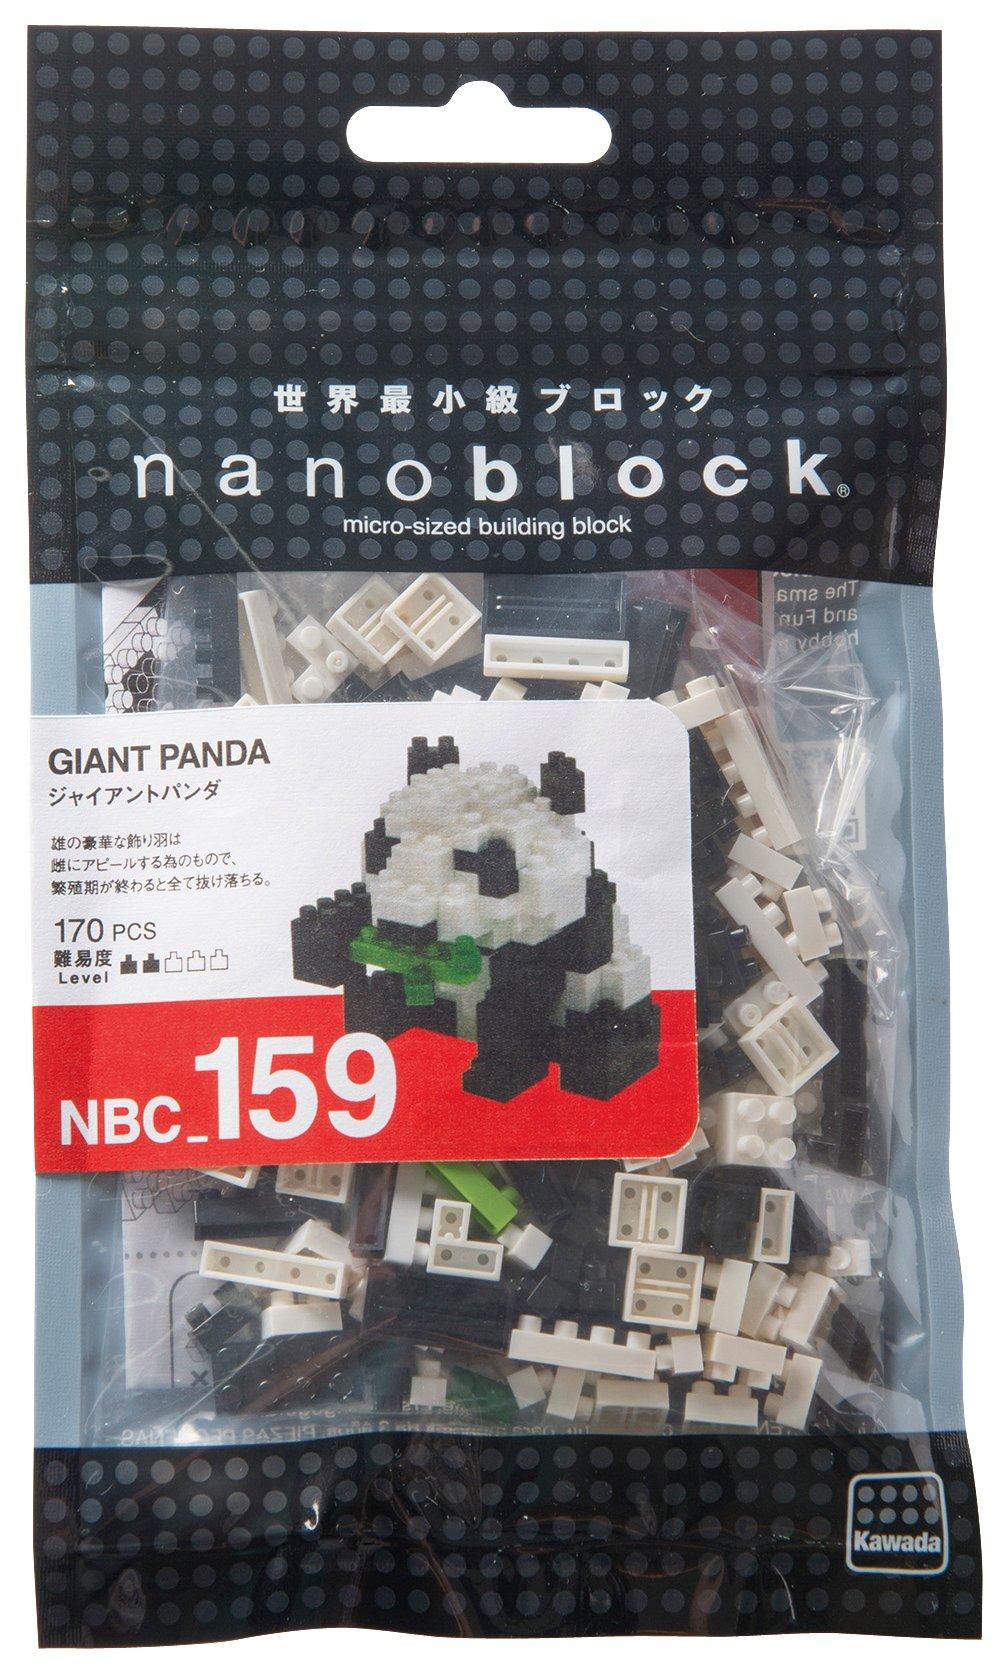 KAWADA NBC_159 Nanoblock Giant Panda Renewal Building Kit 2